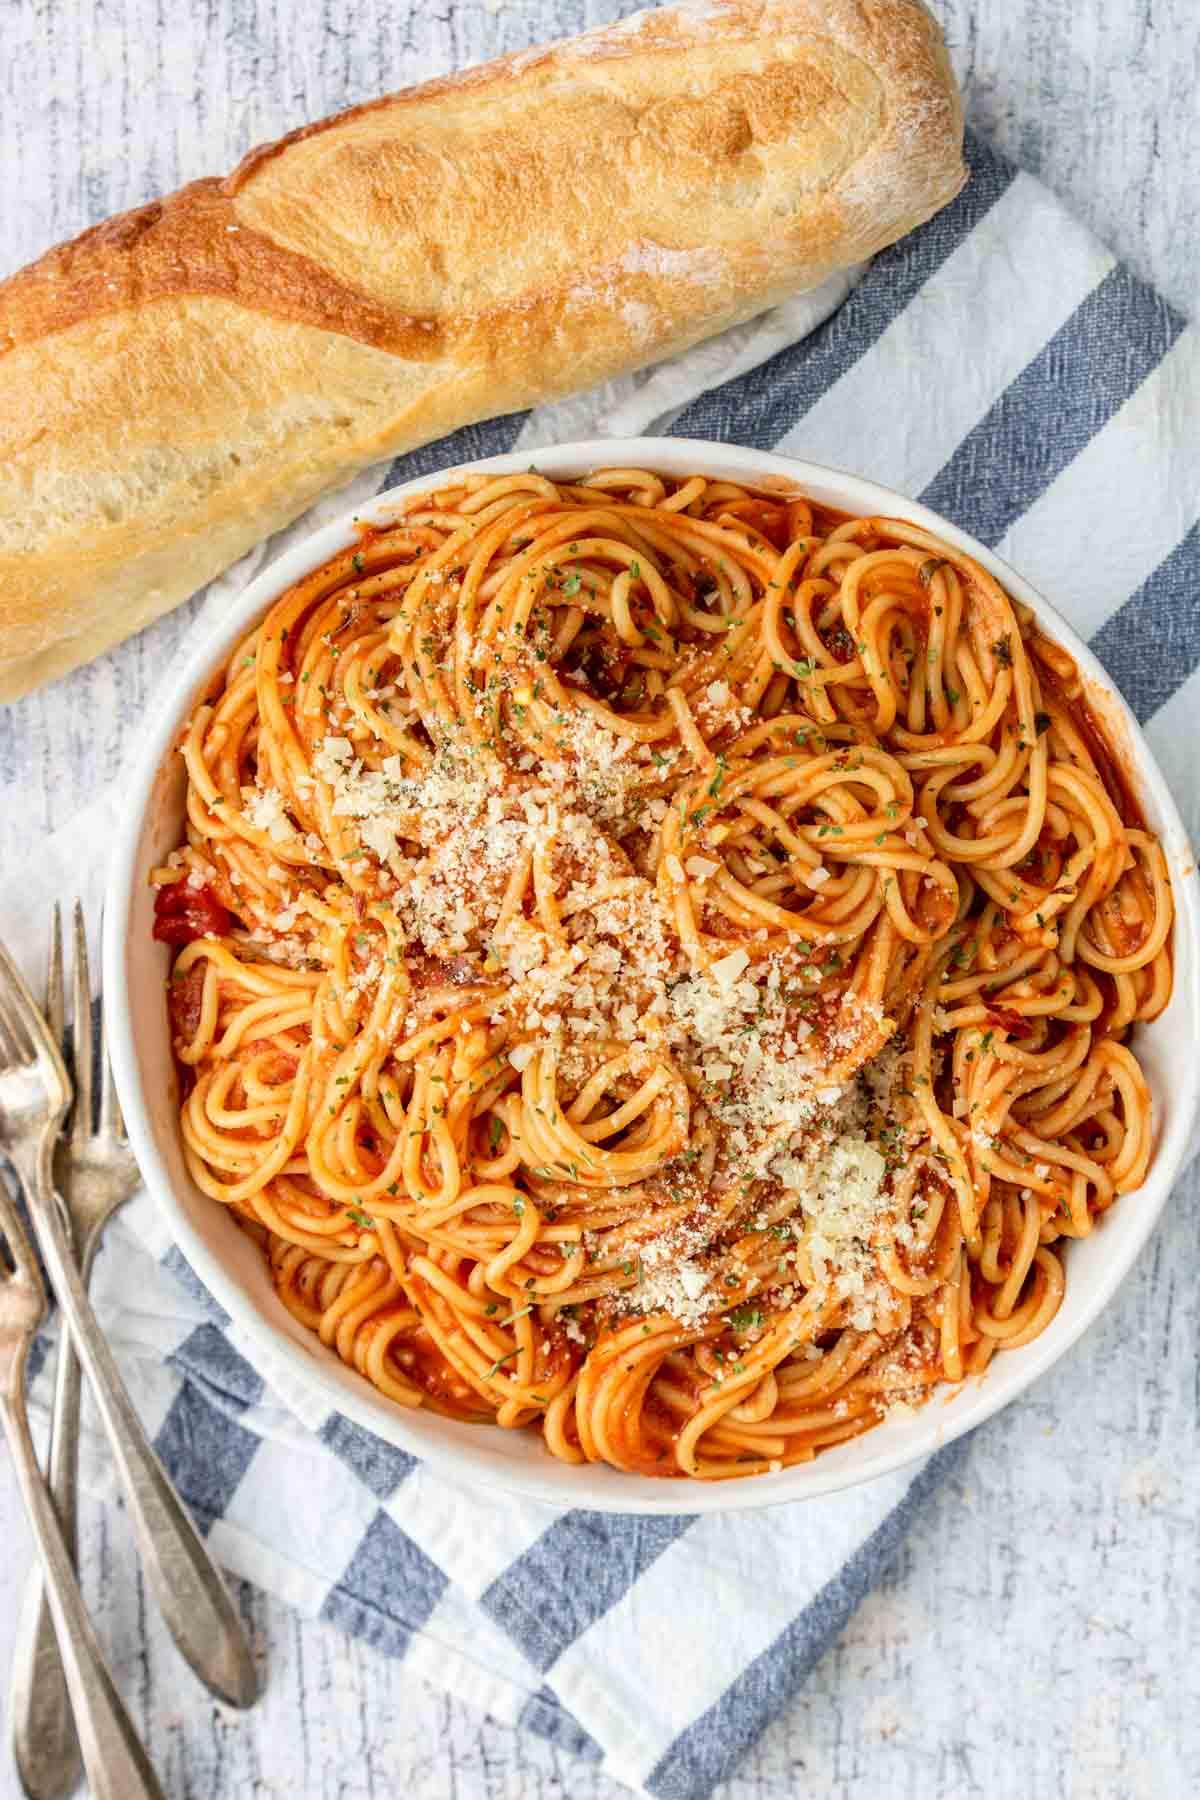 a big bowl of spaghetti with marinara